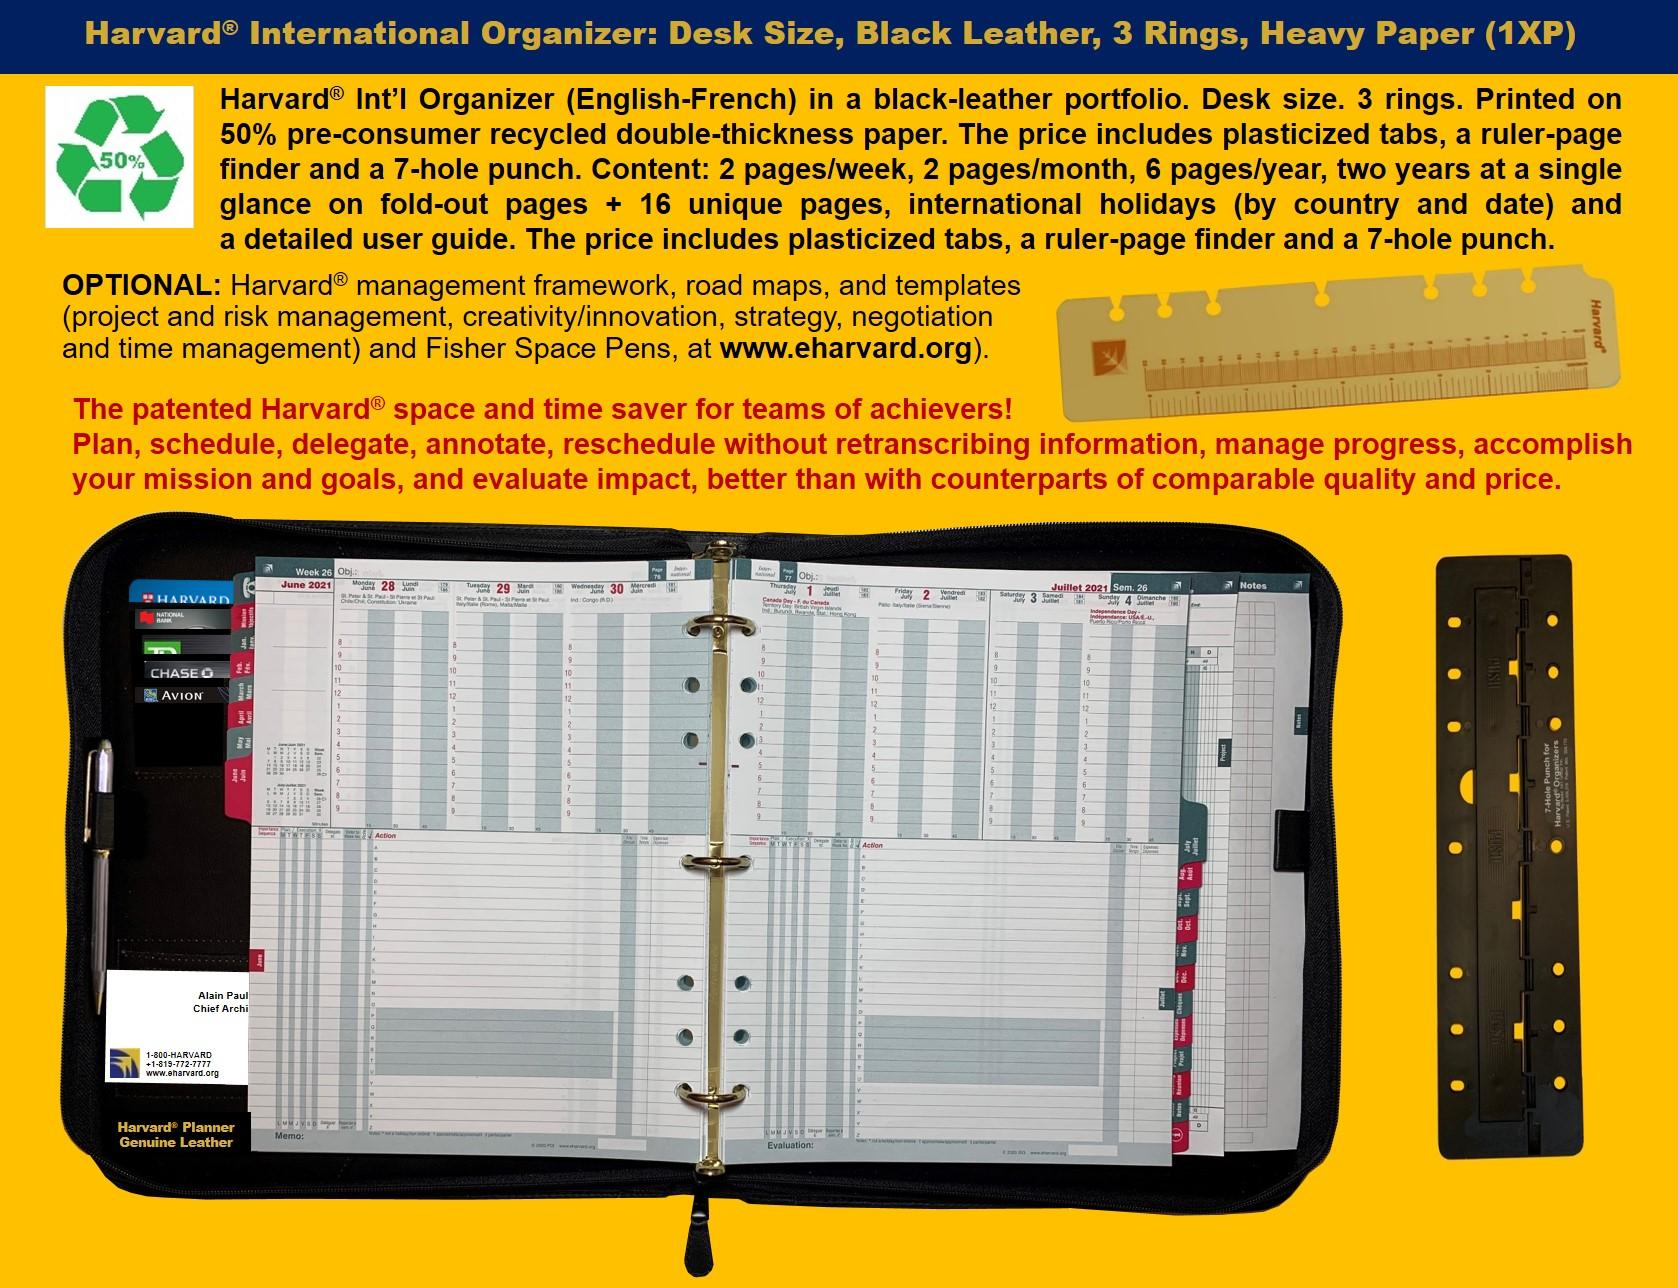 Harvard International Organizer Code (1XP)